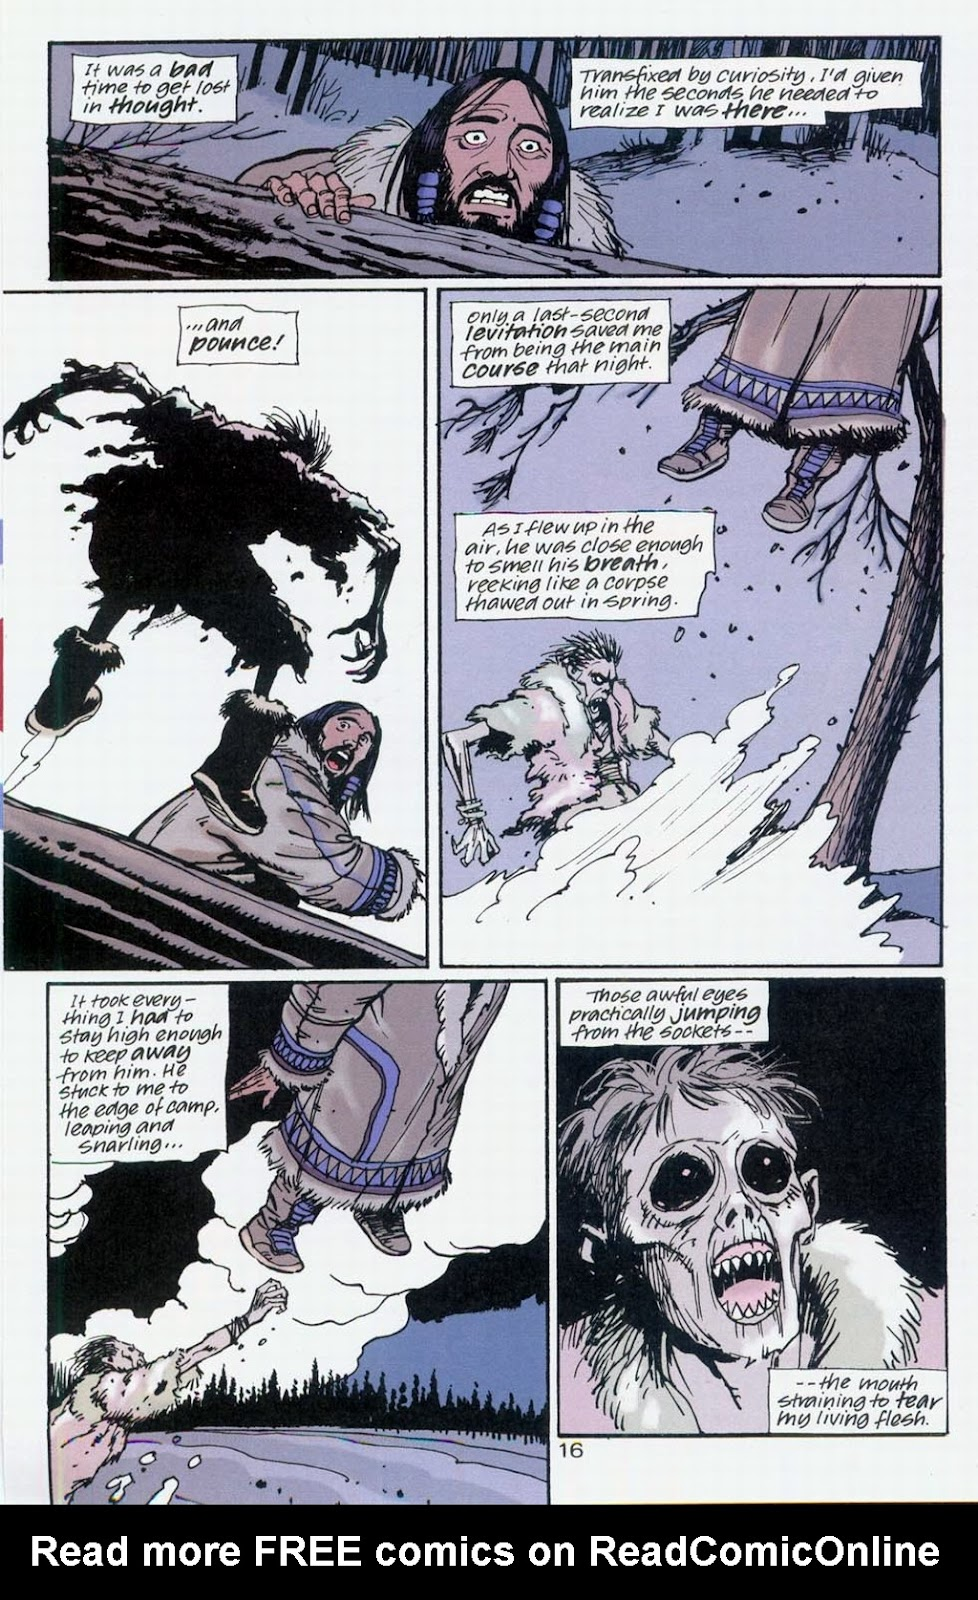 Muktuk Wolfsbreath: Hard-Boiled Shaman issue 1 - Page 16